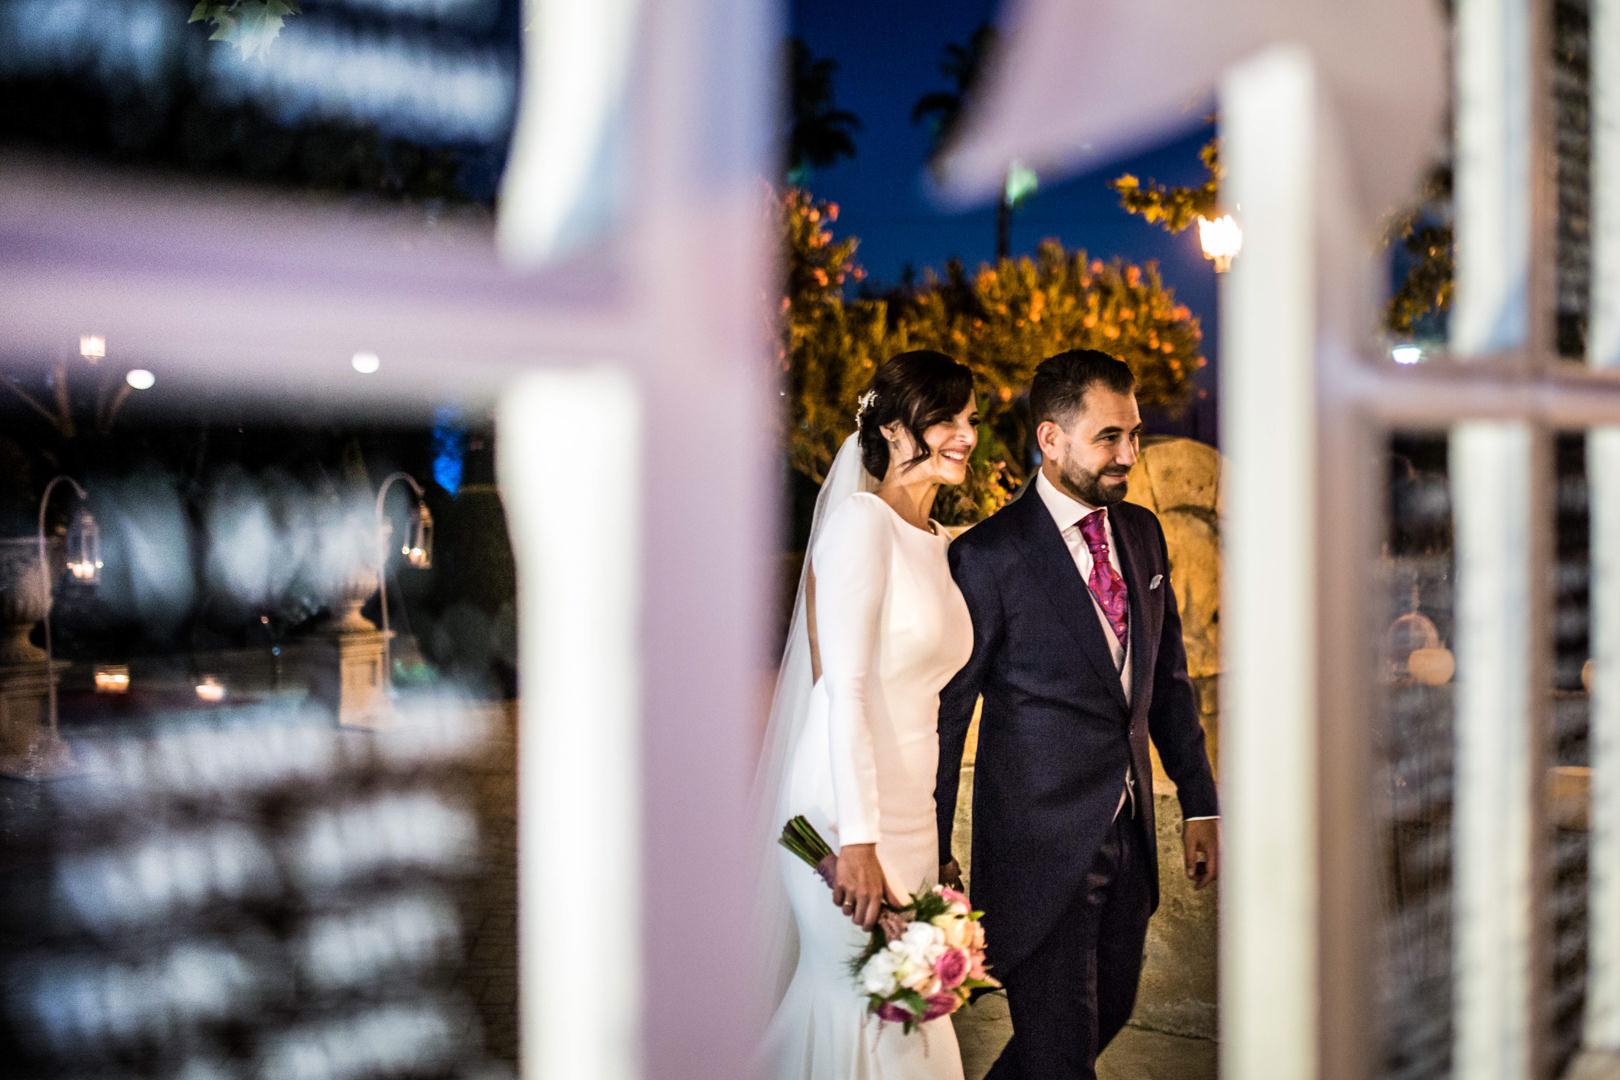 Boda-Irene-Marcos-Dos-Hermanas-Finca-Clotidle-engagement-Rafael-Torres-fotografo-bodas-sevilla-madrid-barcelona-wedding-photographer--32.jpg